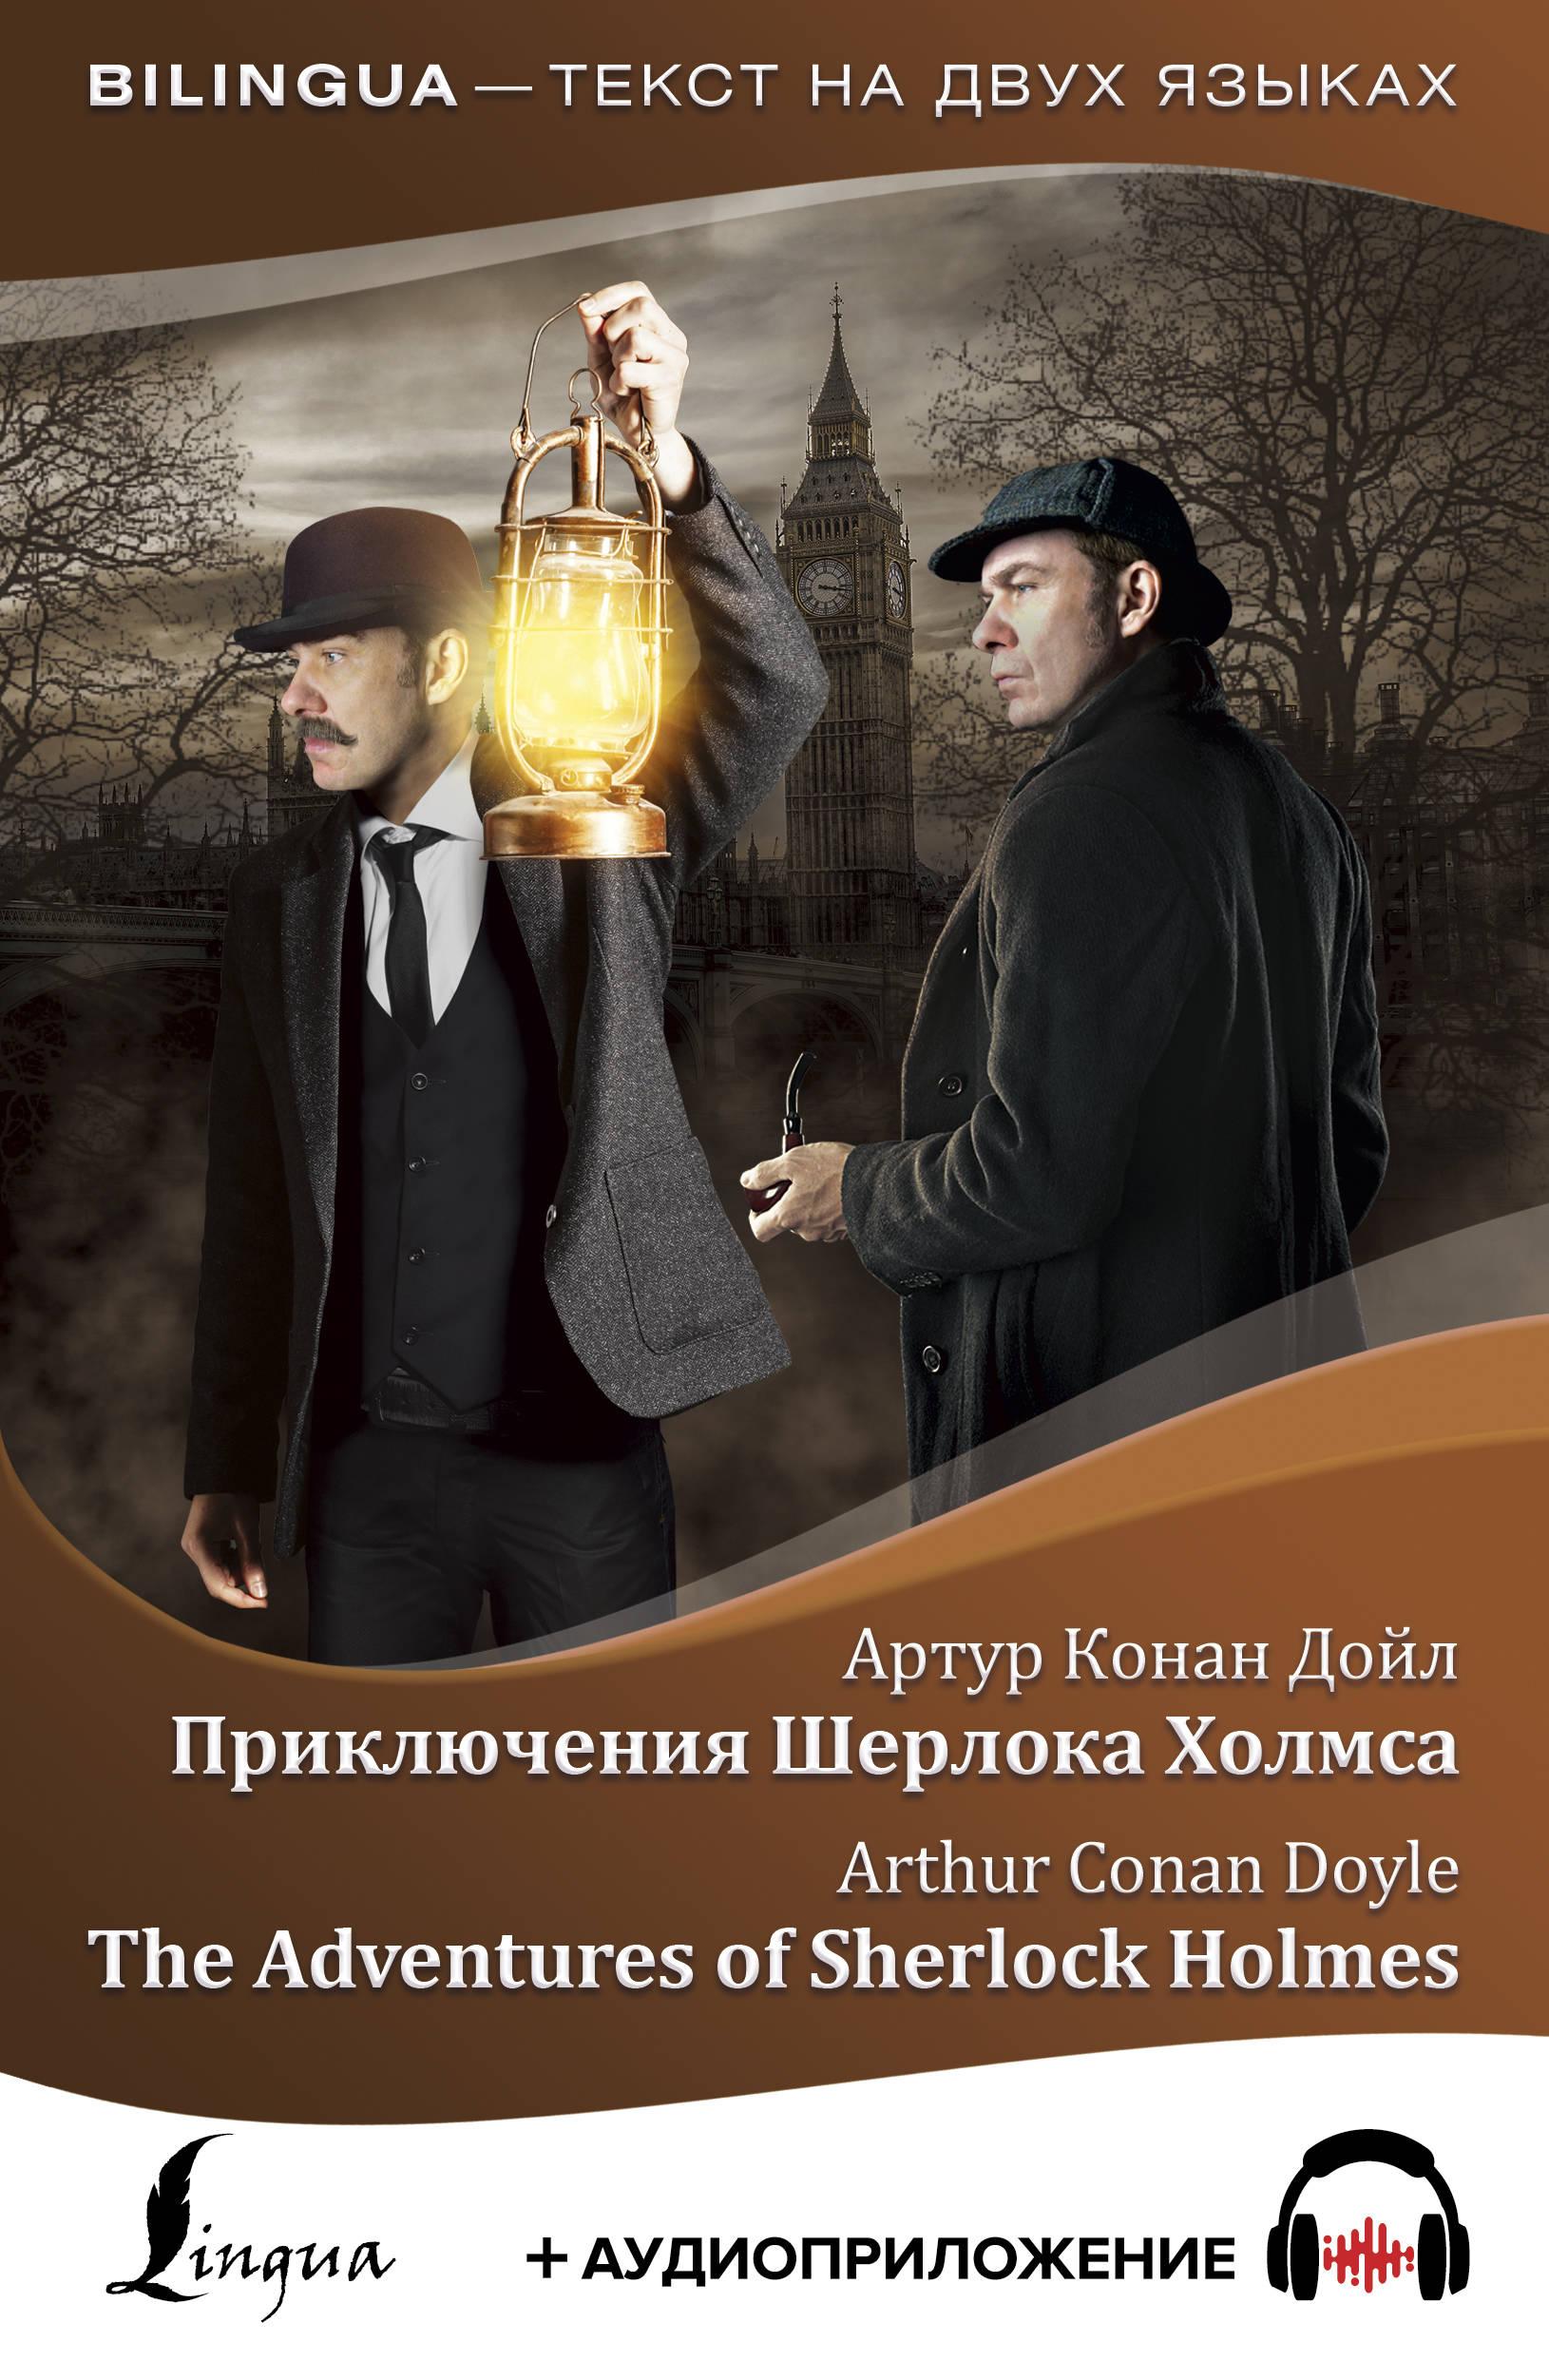 Артур Конан Дойл Приключения Шерлока Холмса = The Adventures of Sherlock Holmes + аудиоприложение LECTA артур конан дойл приключения шерлока холмса человек с рассеченной губой the man with the twisted lip